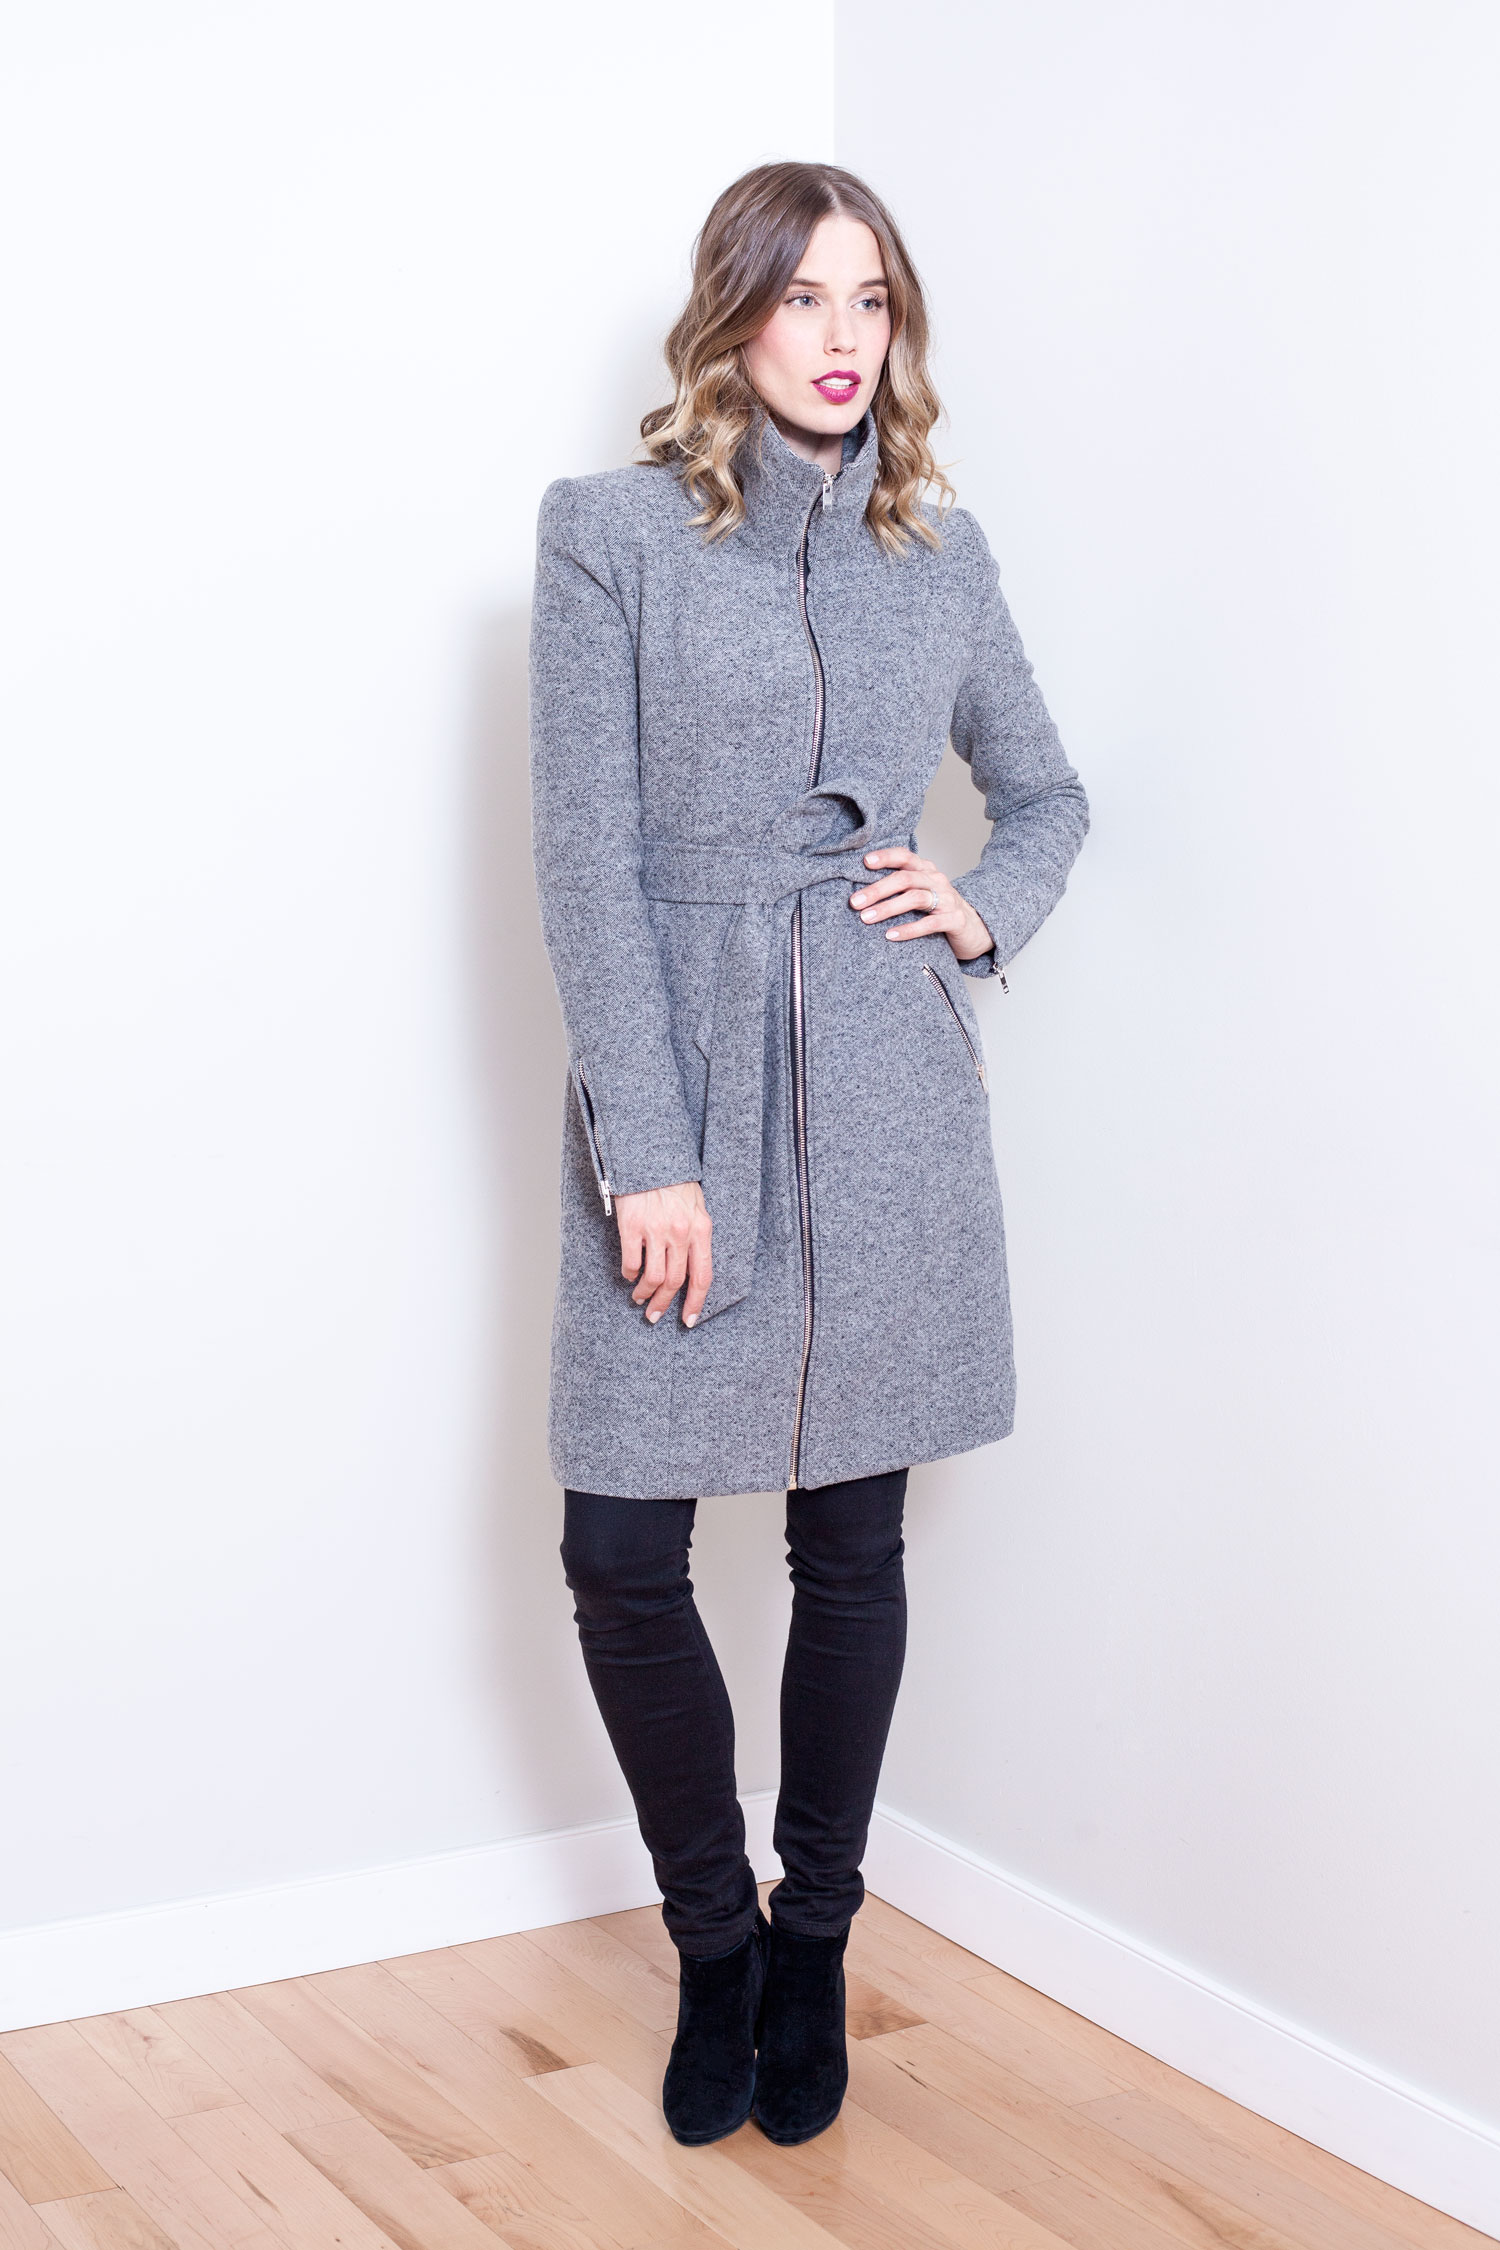 Front-Closed-Grey-Zipper-Coat.jpg